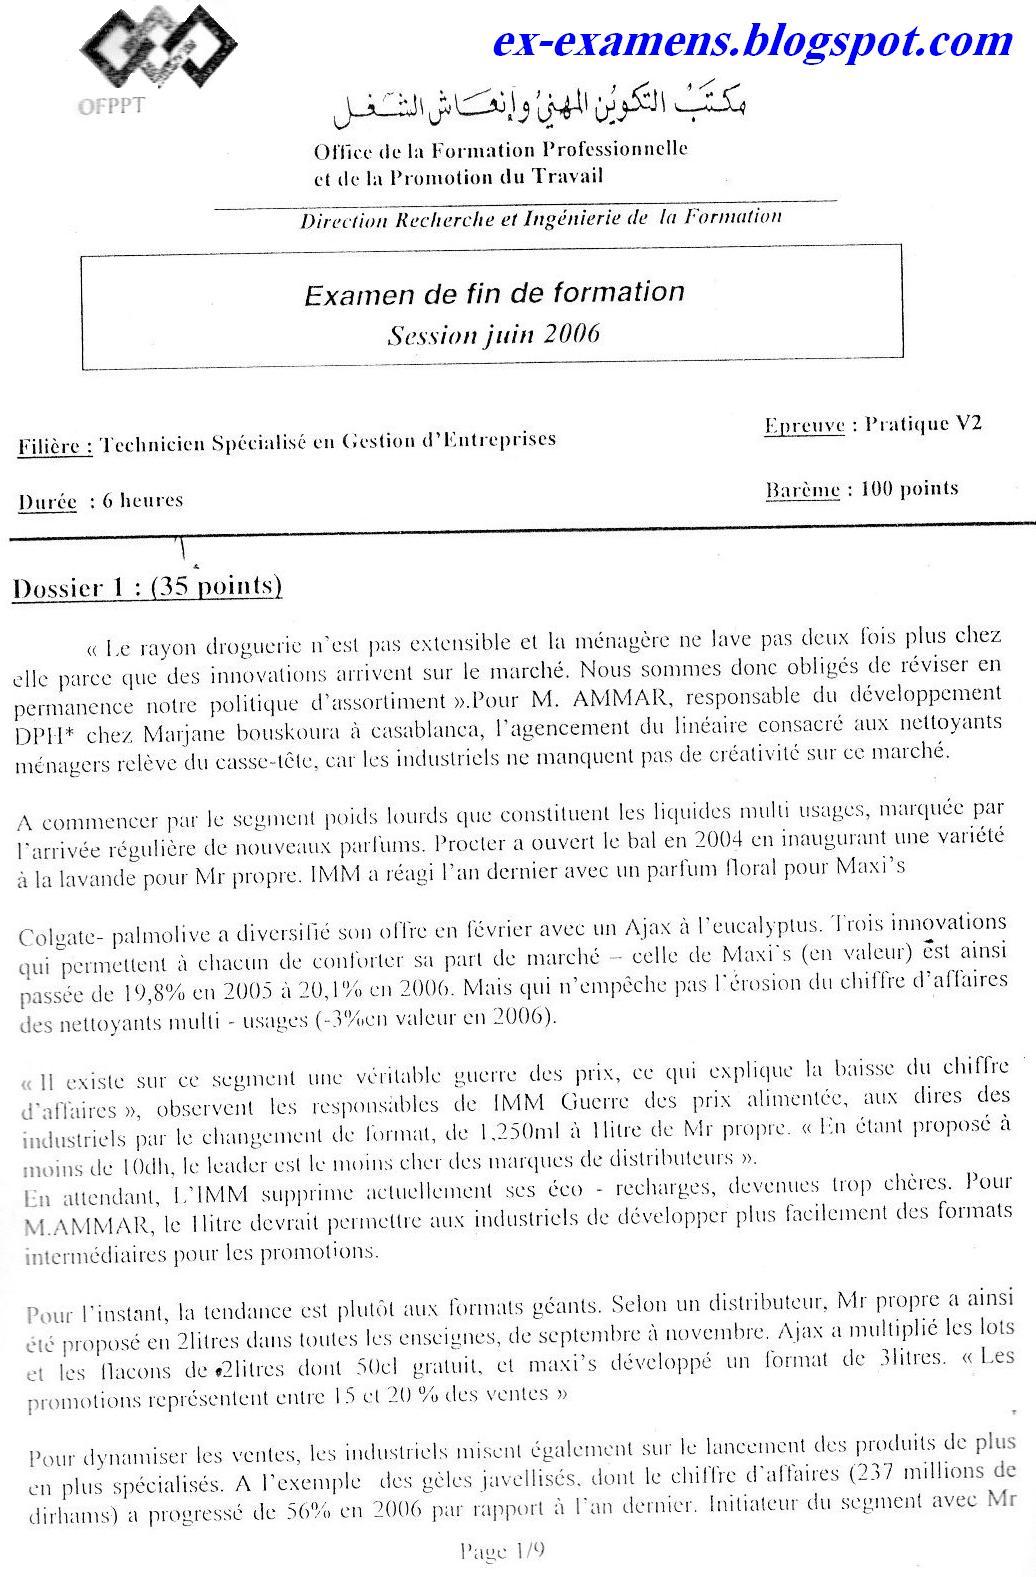 FORMATION FIN EXAMEN TÉLÉCHARGER DE TSGE DE